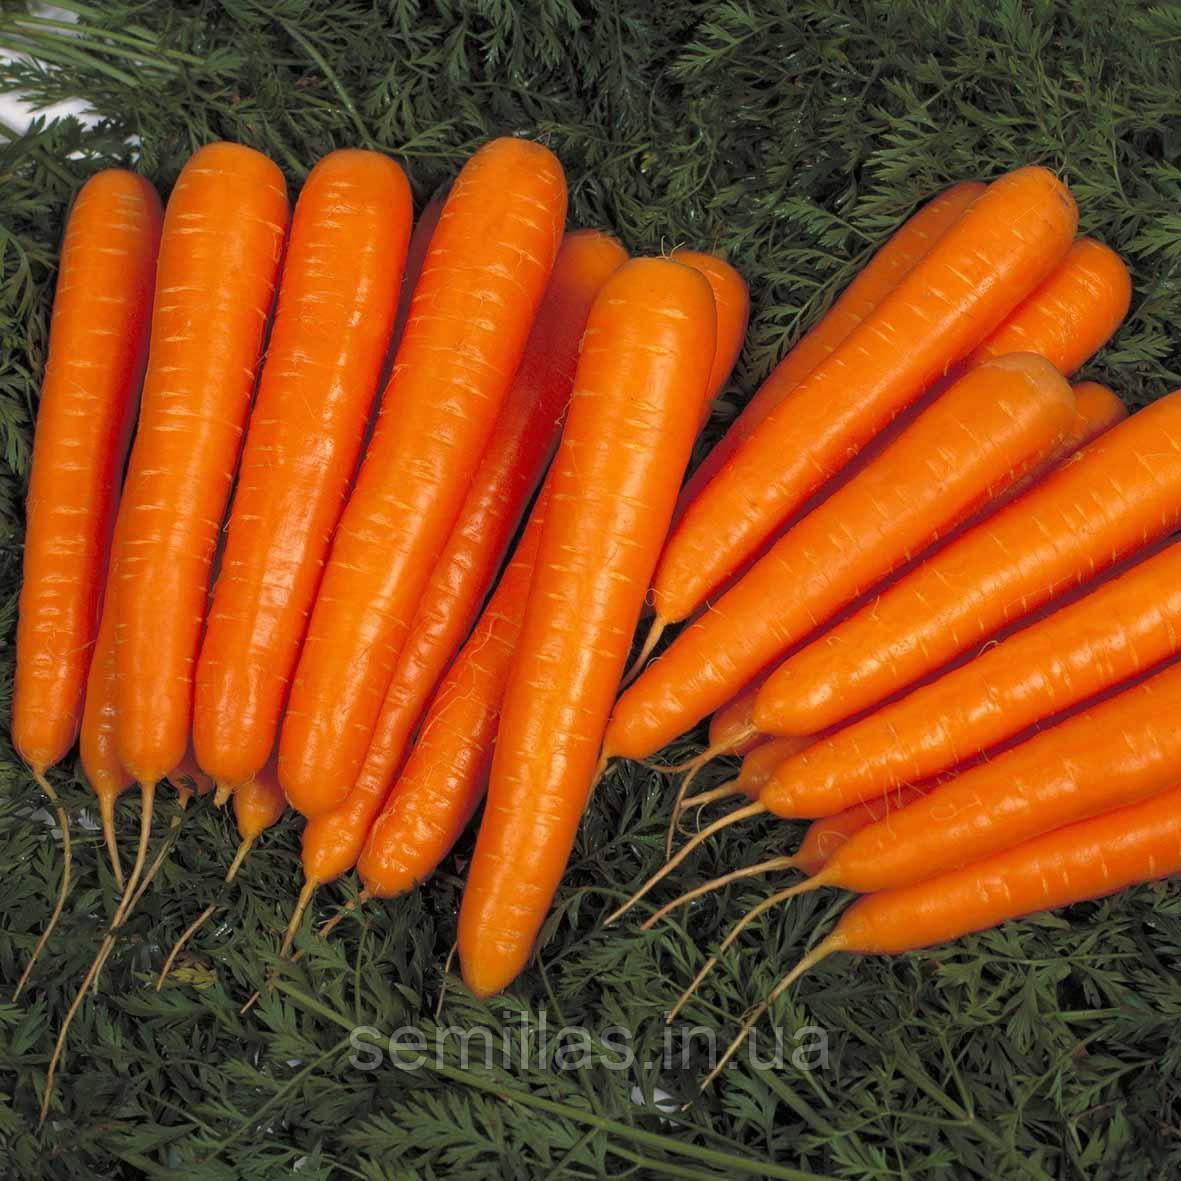 Семена моркови Лагуна F1 (Laguna F1), 25000 сем. (1,6-1,8 мм)